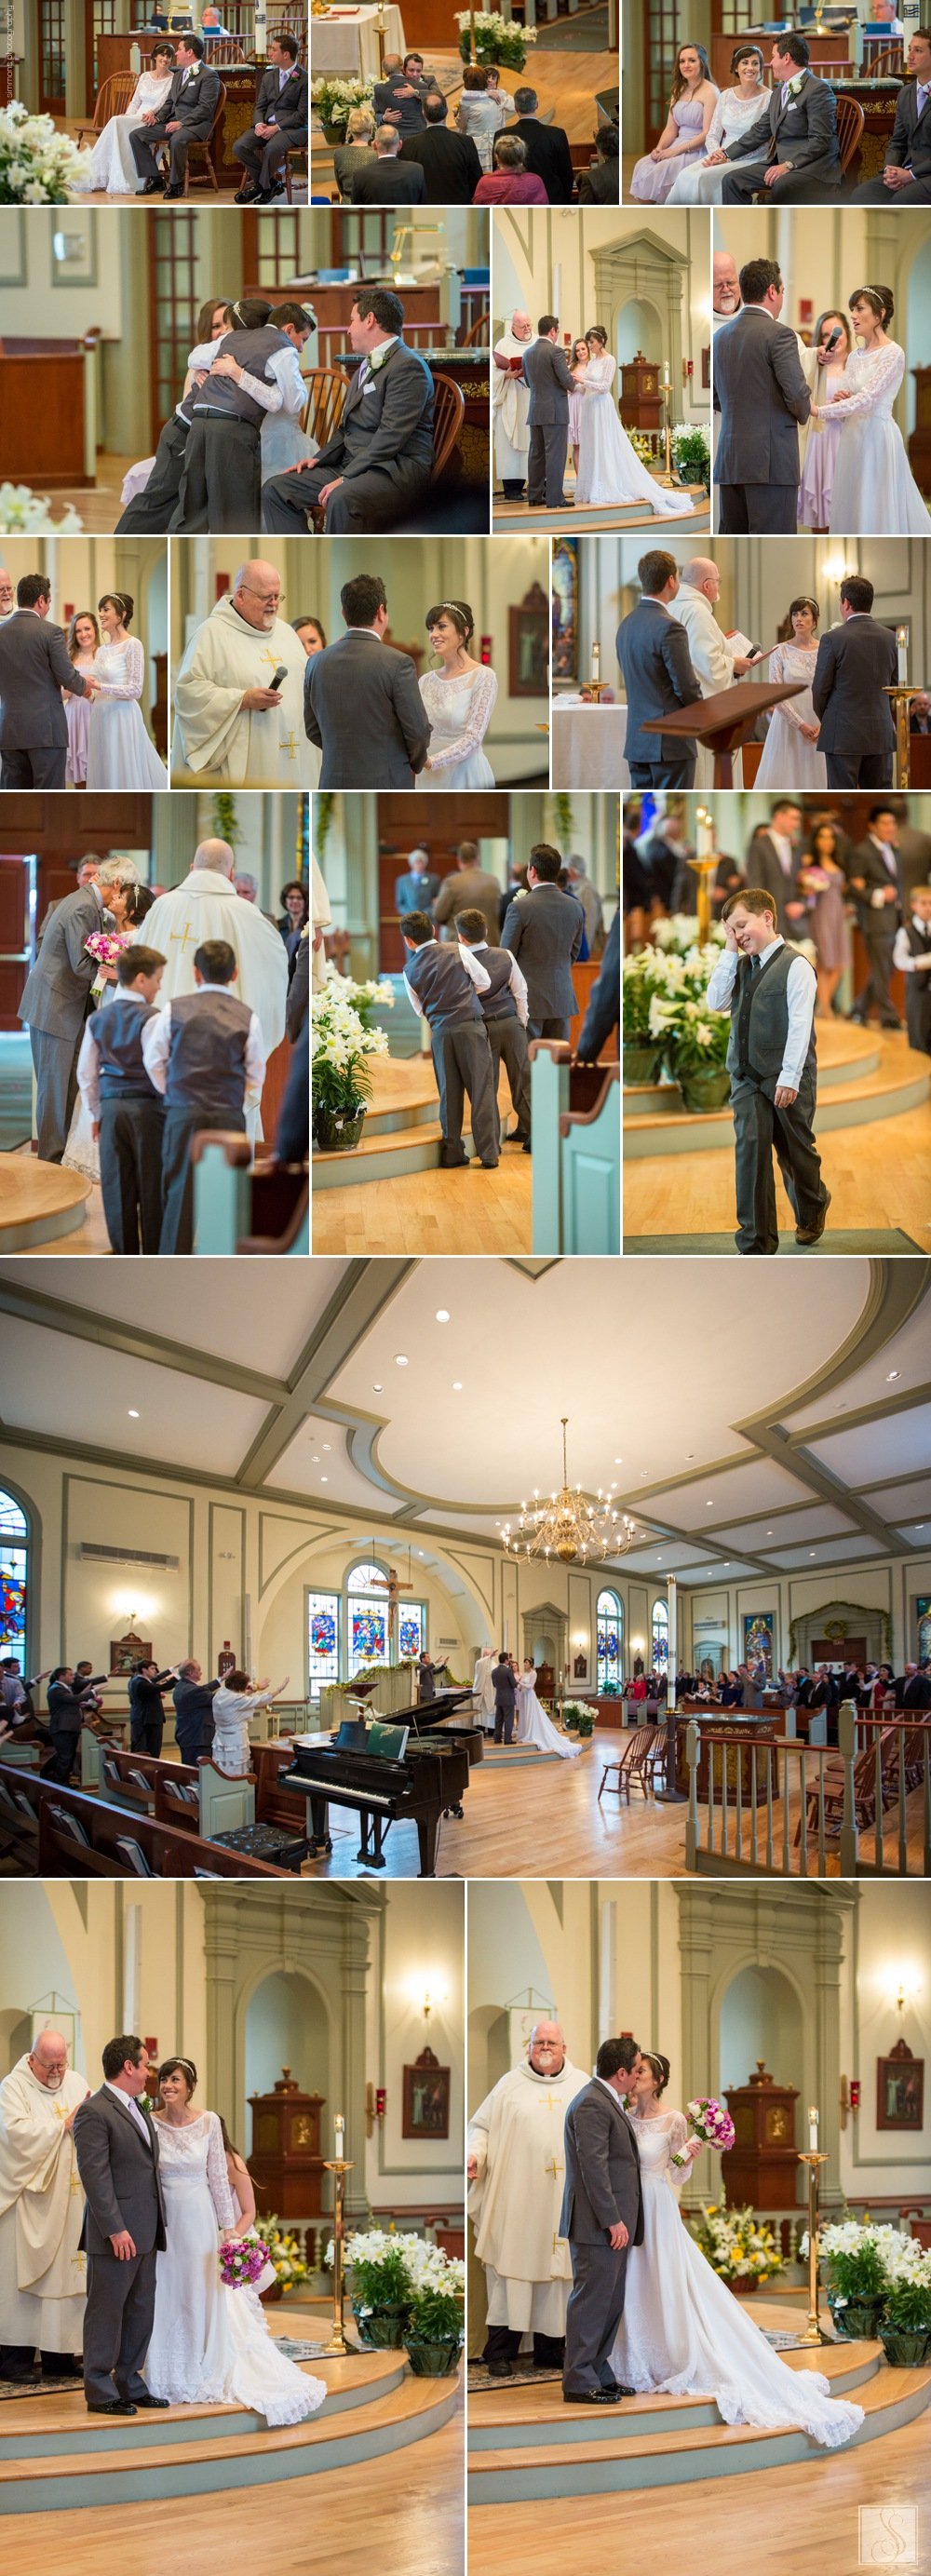 Holy Family Parish Church wedding